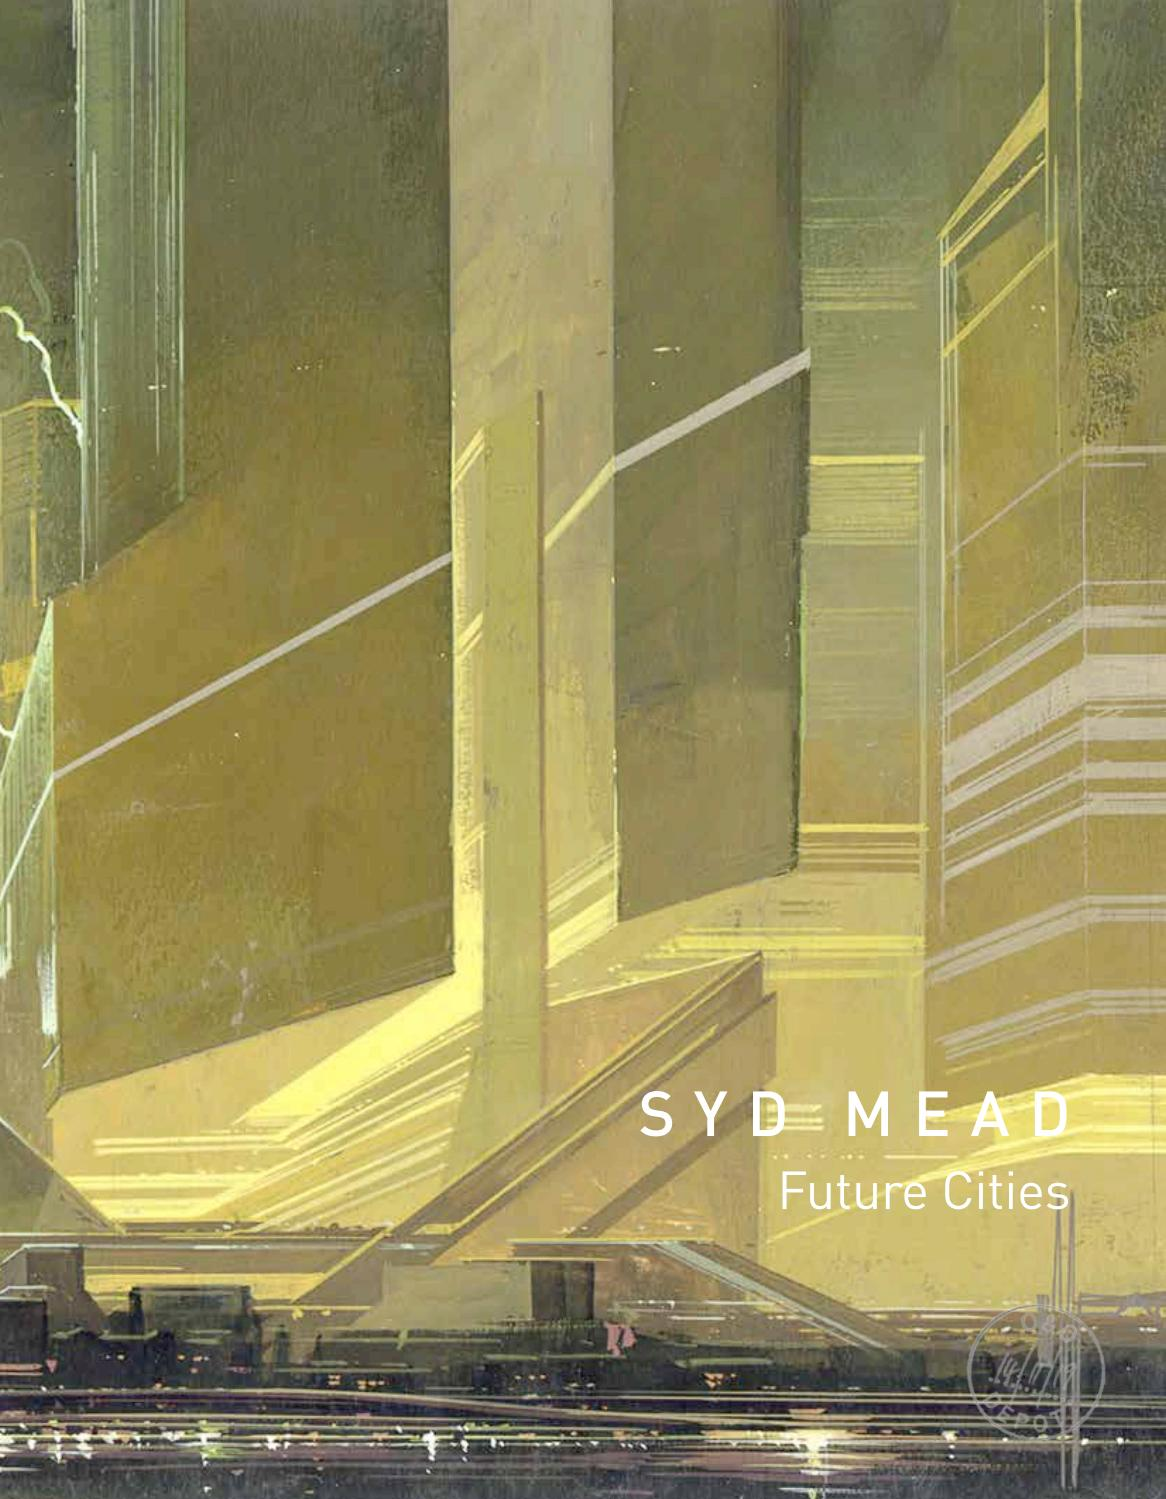 Syd Mead Concept Art : concept, Baukunst, Issuu